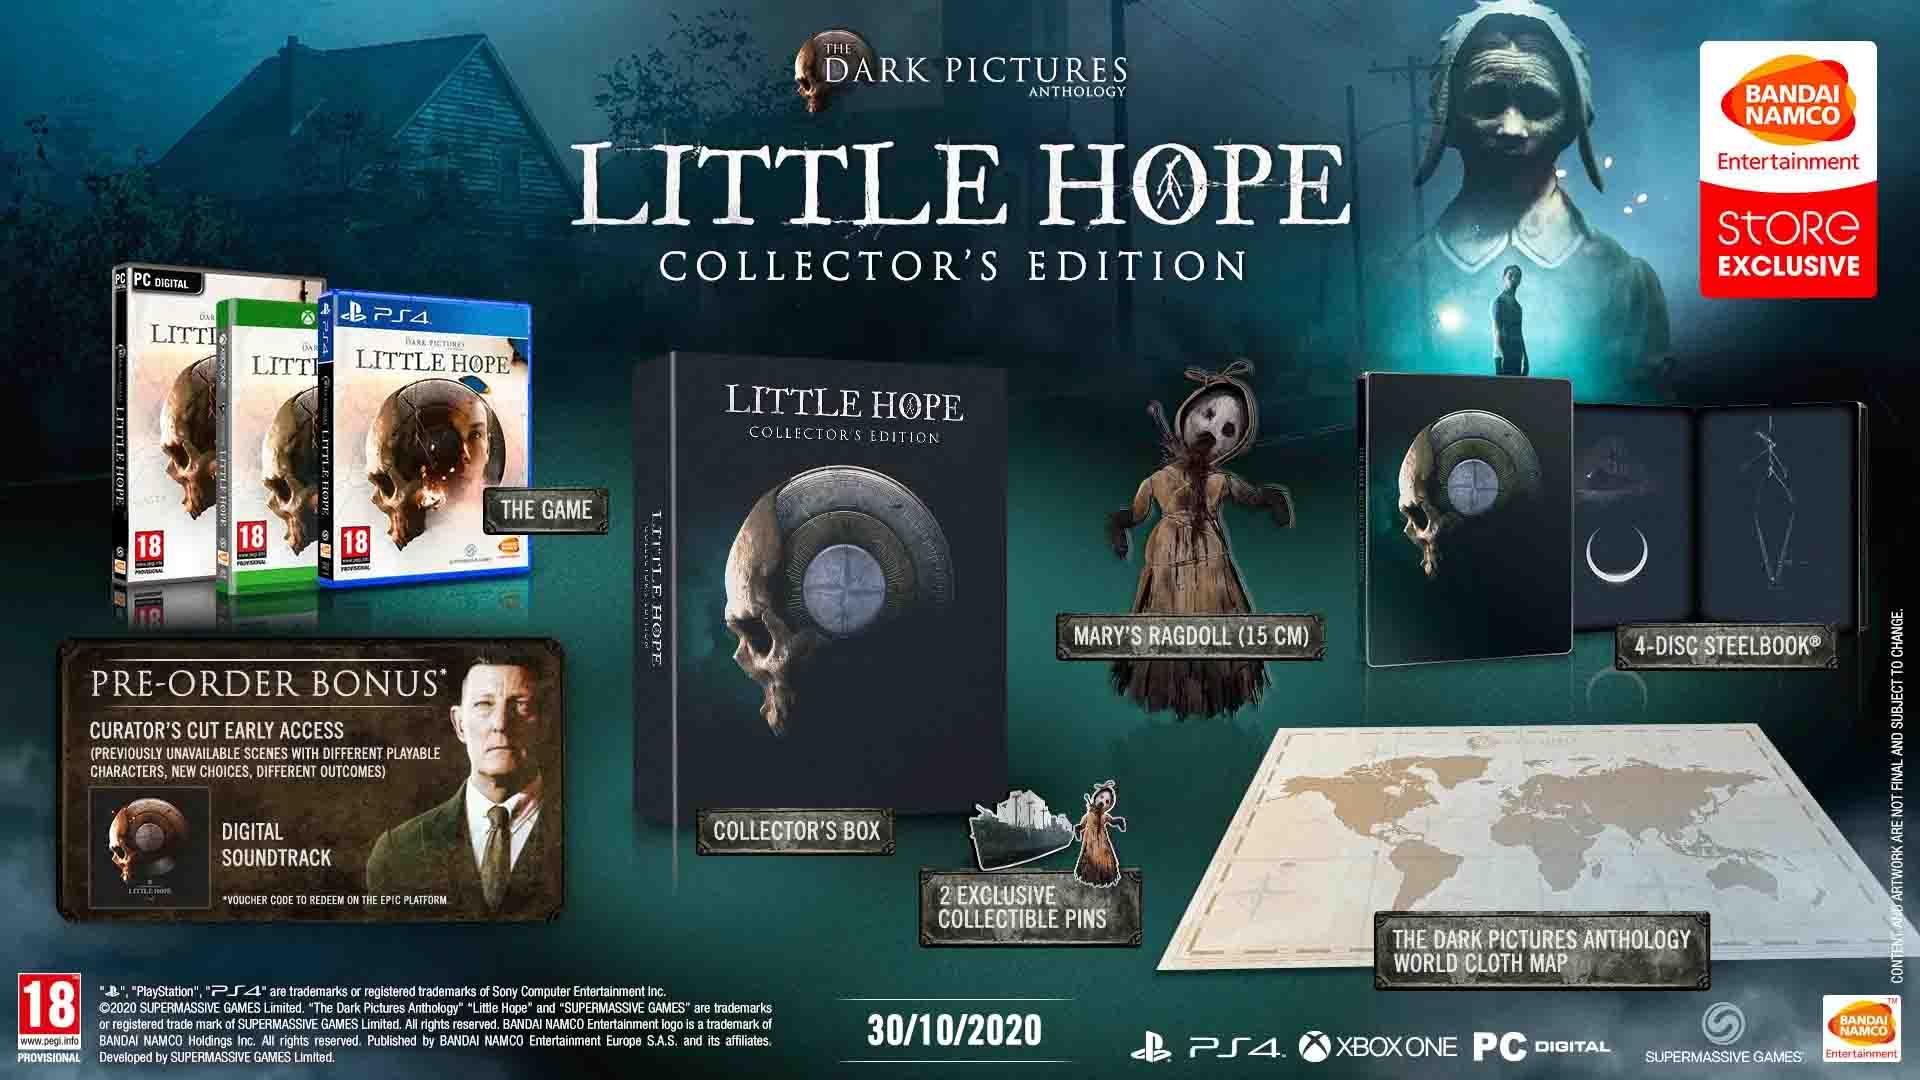 Little Hope CE